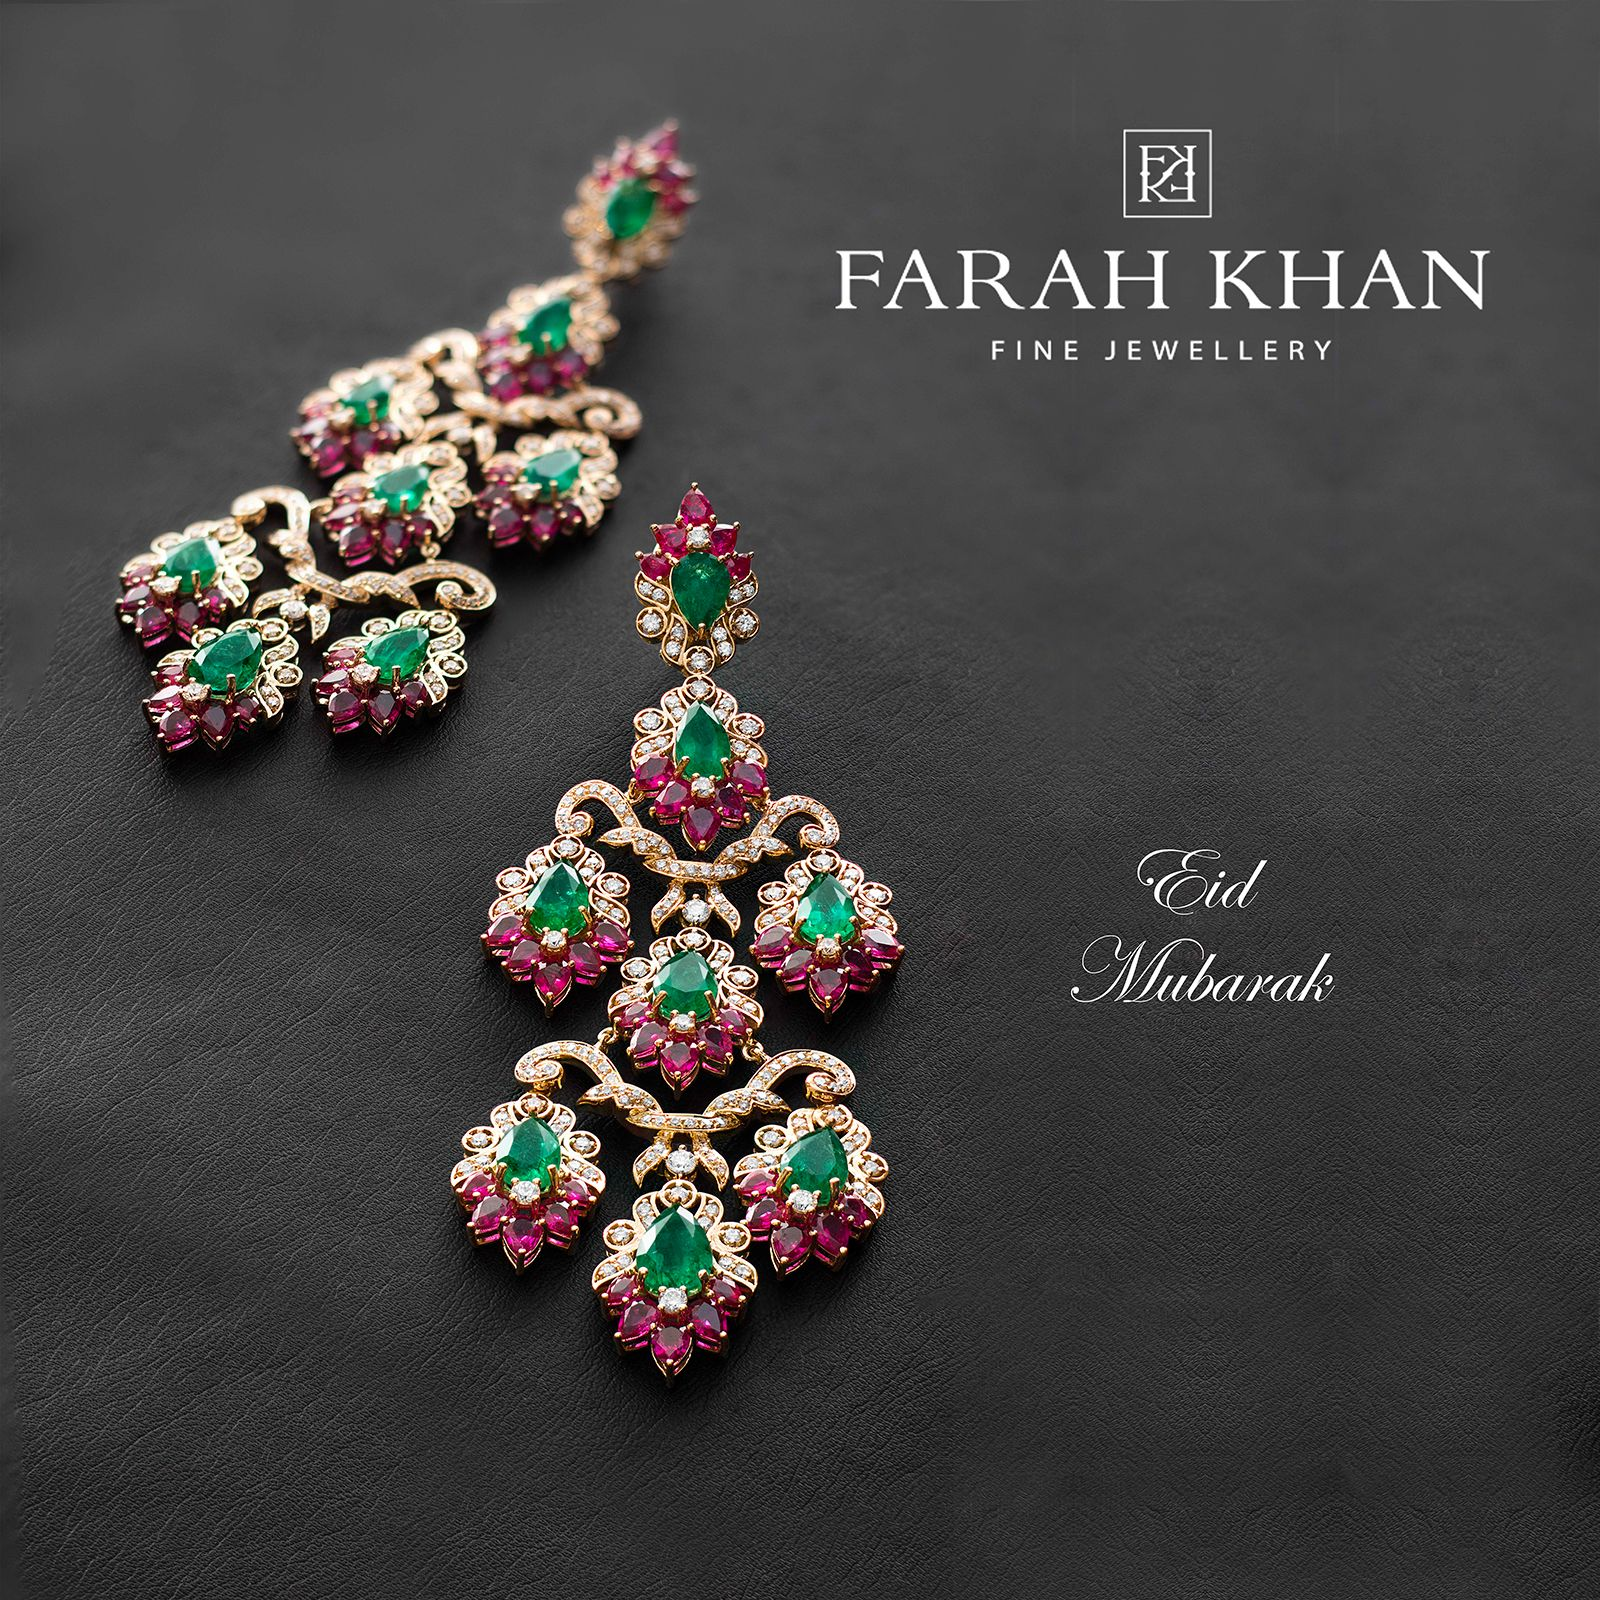 Farah Khan Fine Jewellery wishes you Happy EID Mubarak eidmubarak